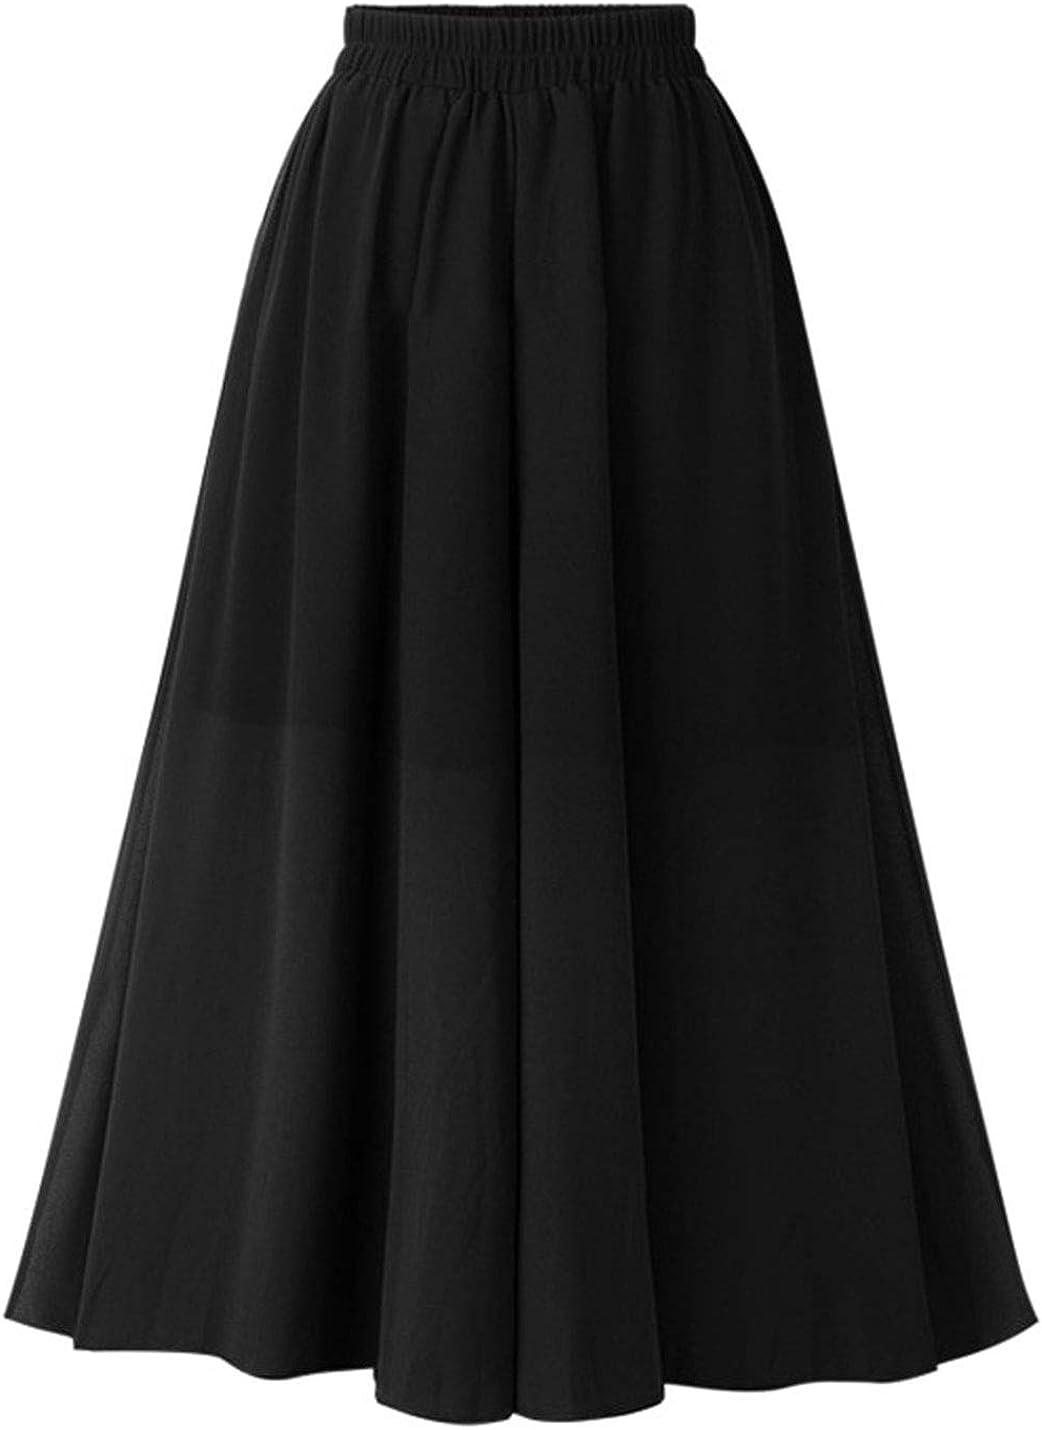 Uaneo Women's Casual Loose Black High Elastic Waist Chiffon Swing Midi Skirt